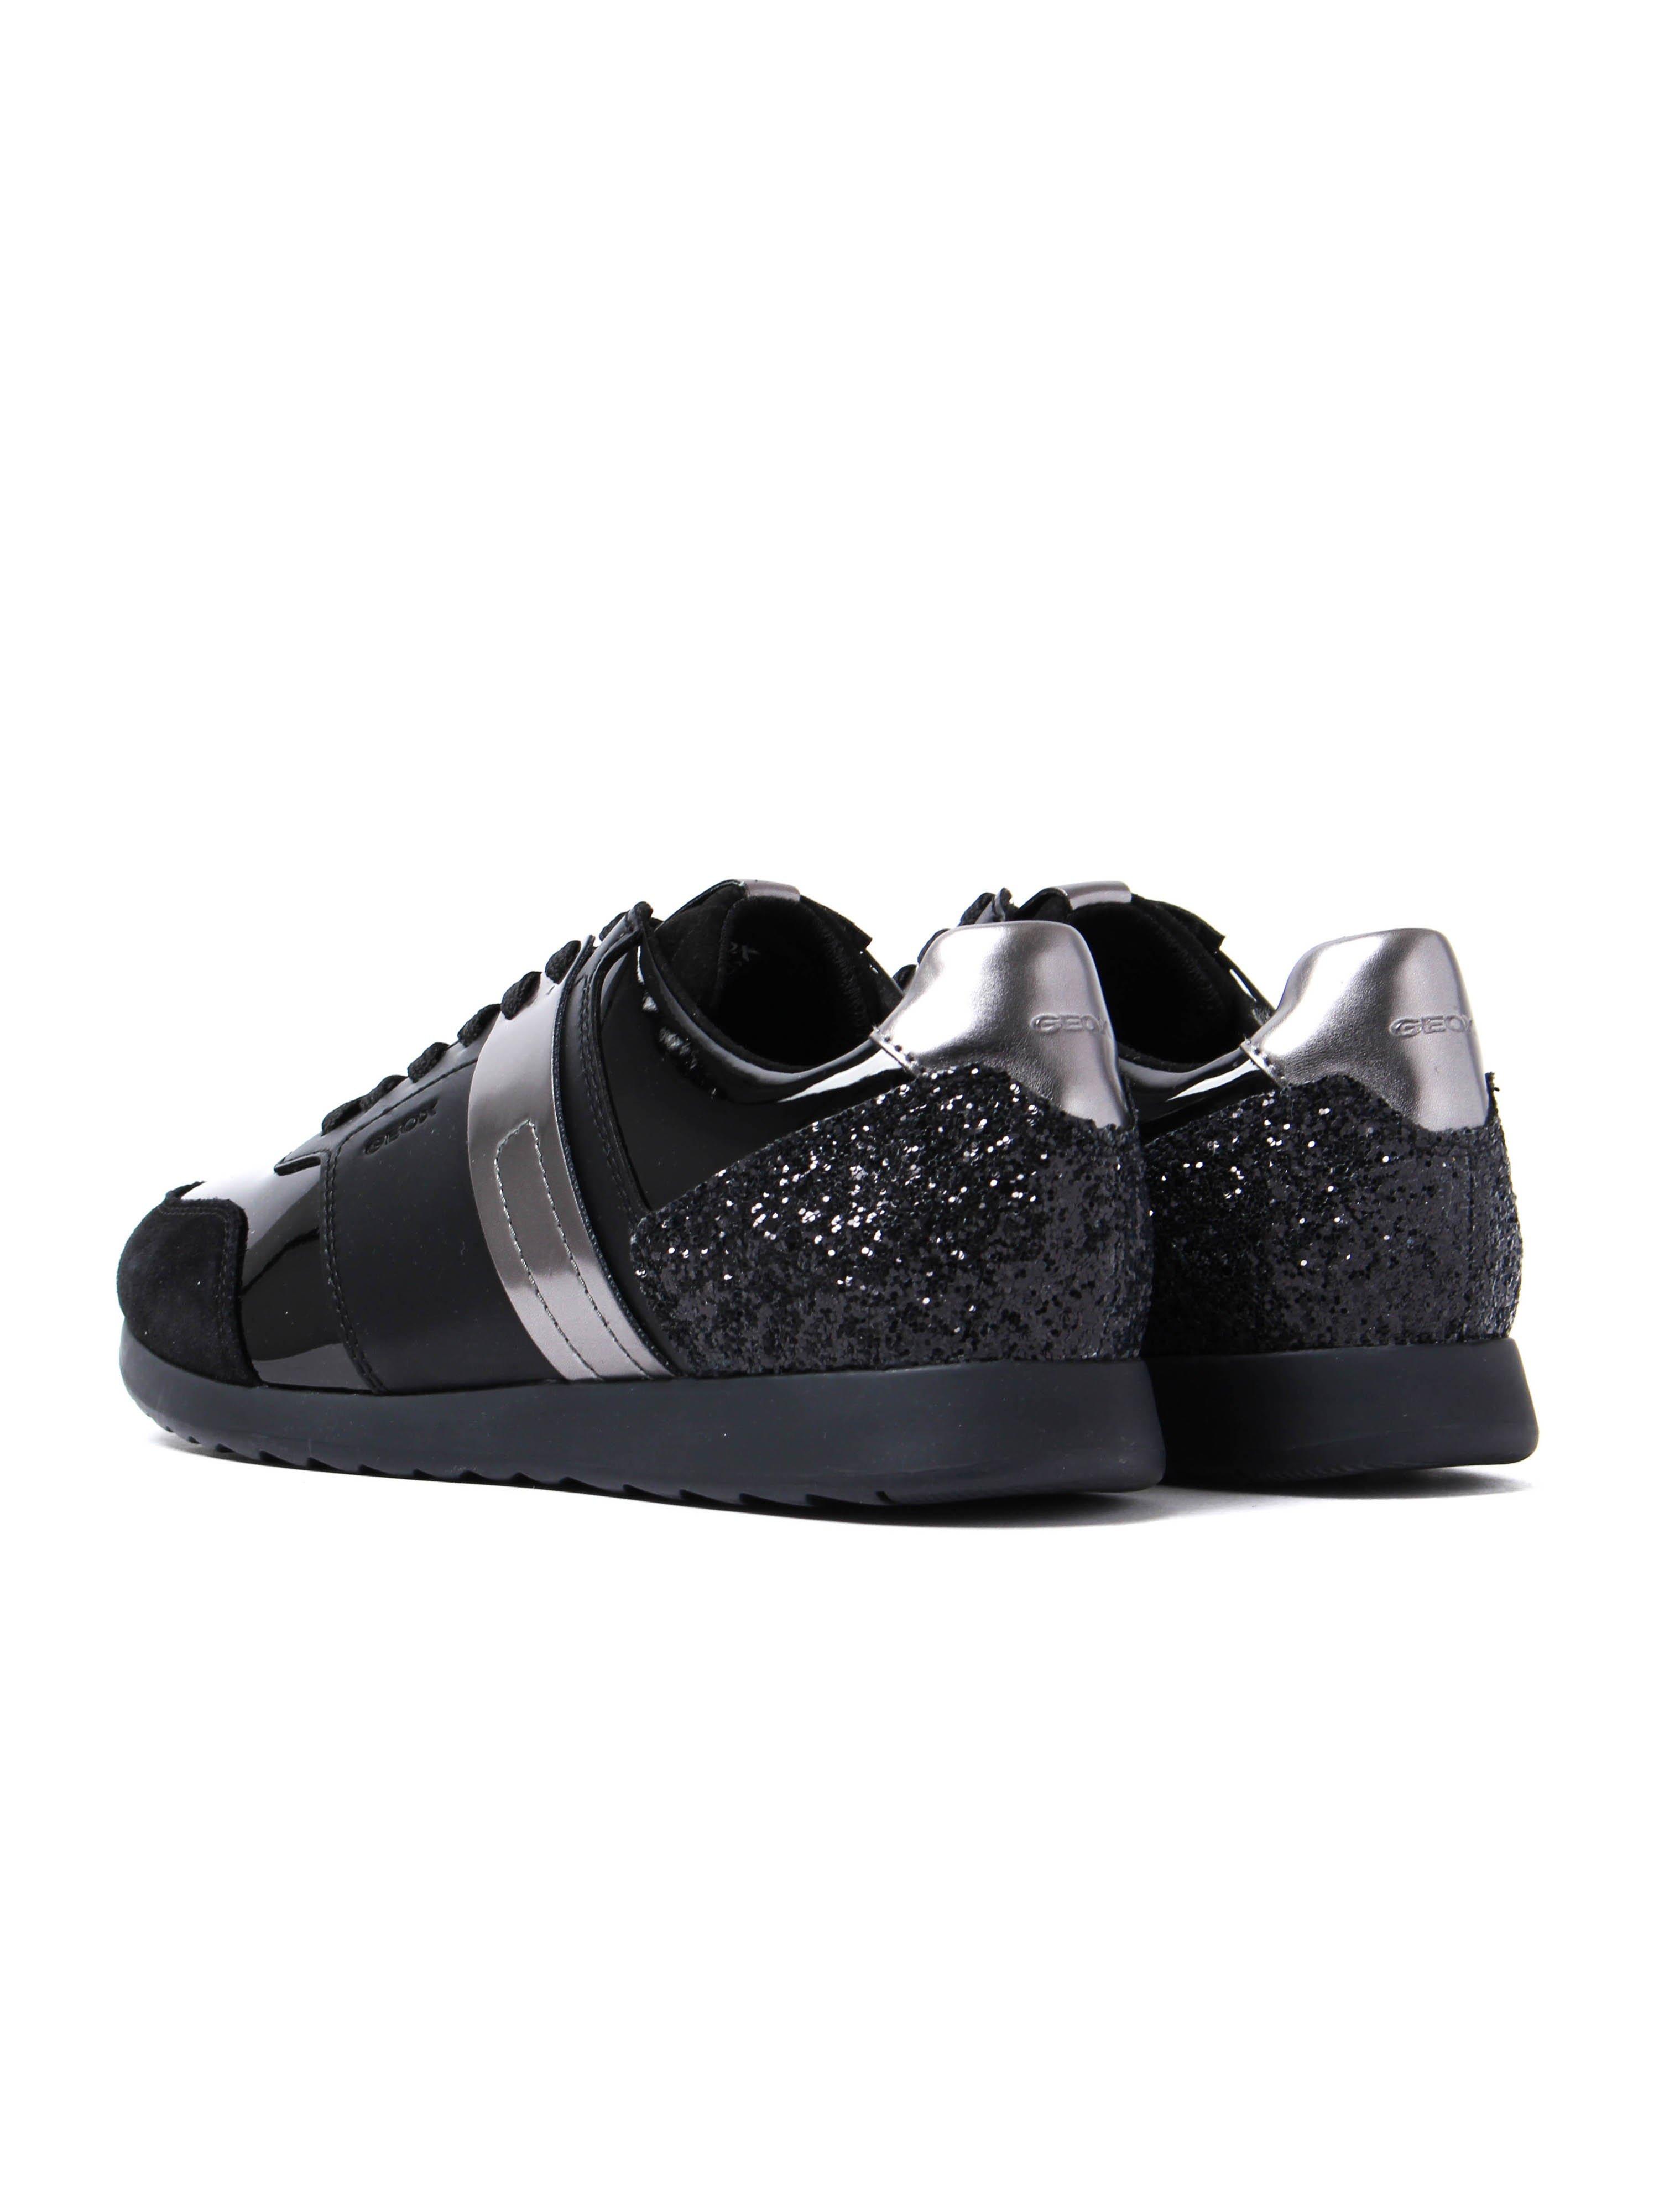 Geox Women's Deynna Glitter Leather Trainers - Black Patent